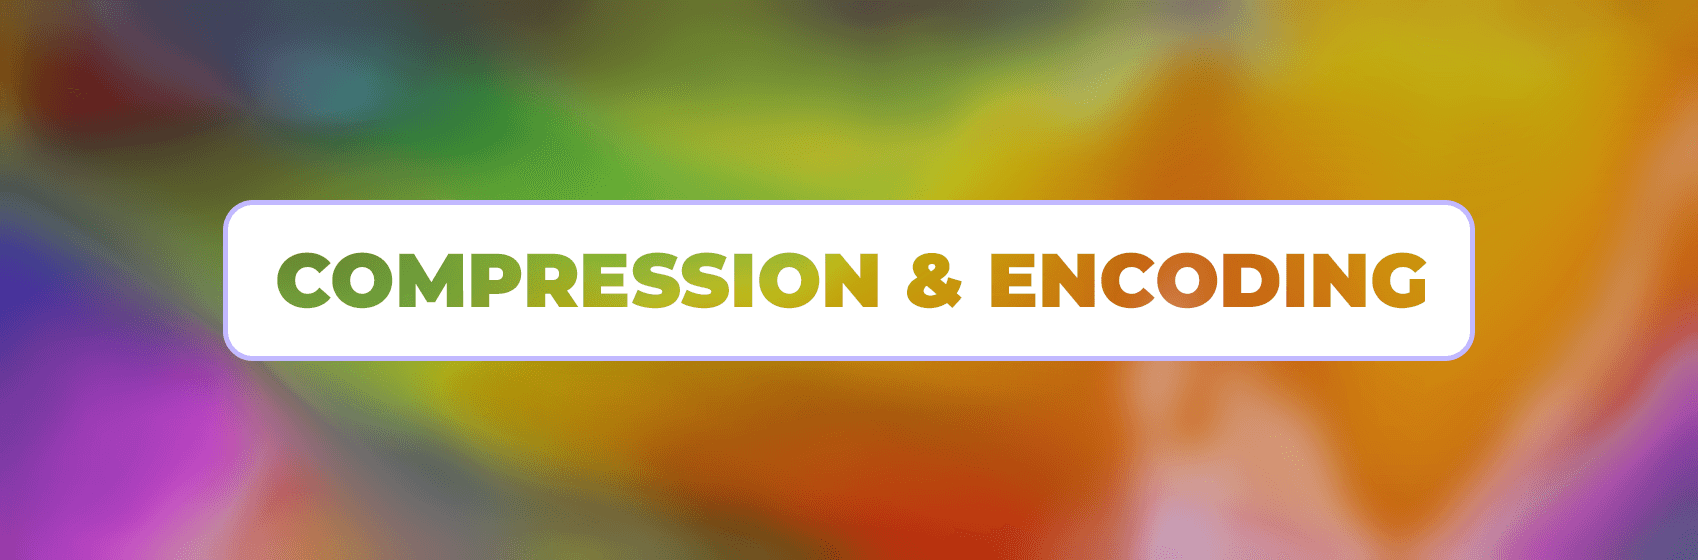 Compression & Encoding